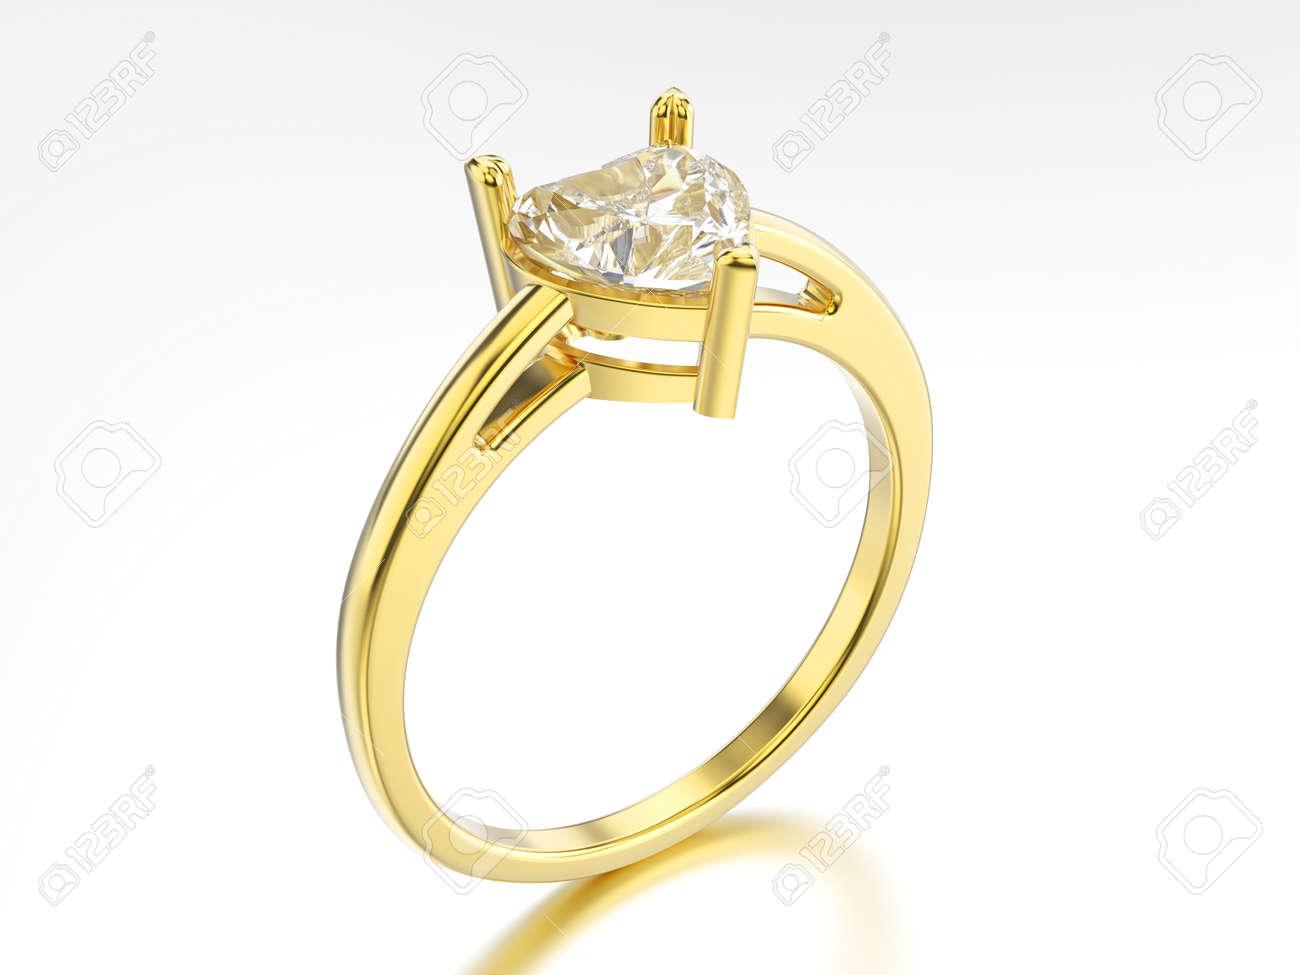 3 D イラスト分離された黄色の金の婚約指輪ダイヤモンド ハート白い背景